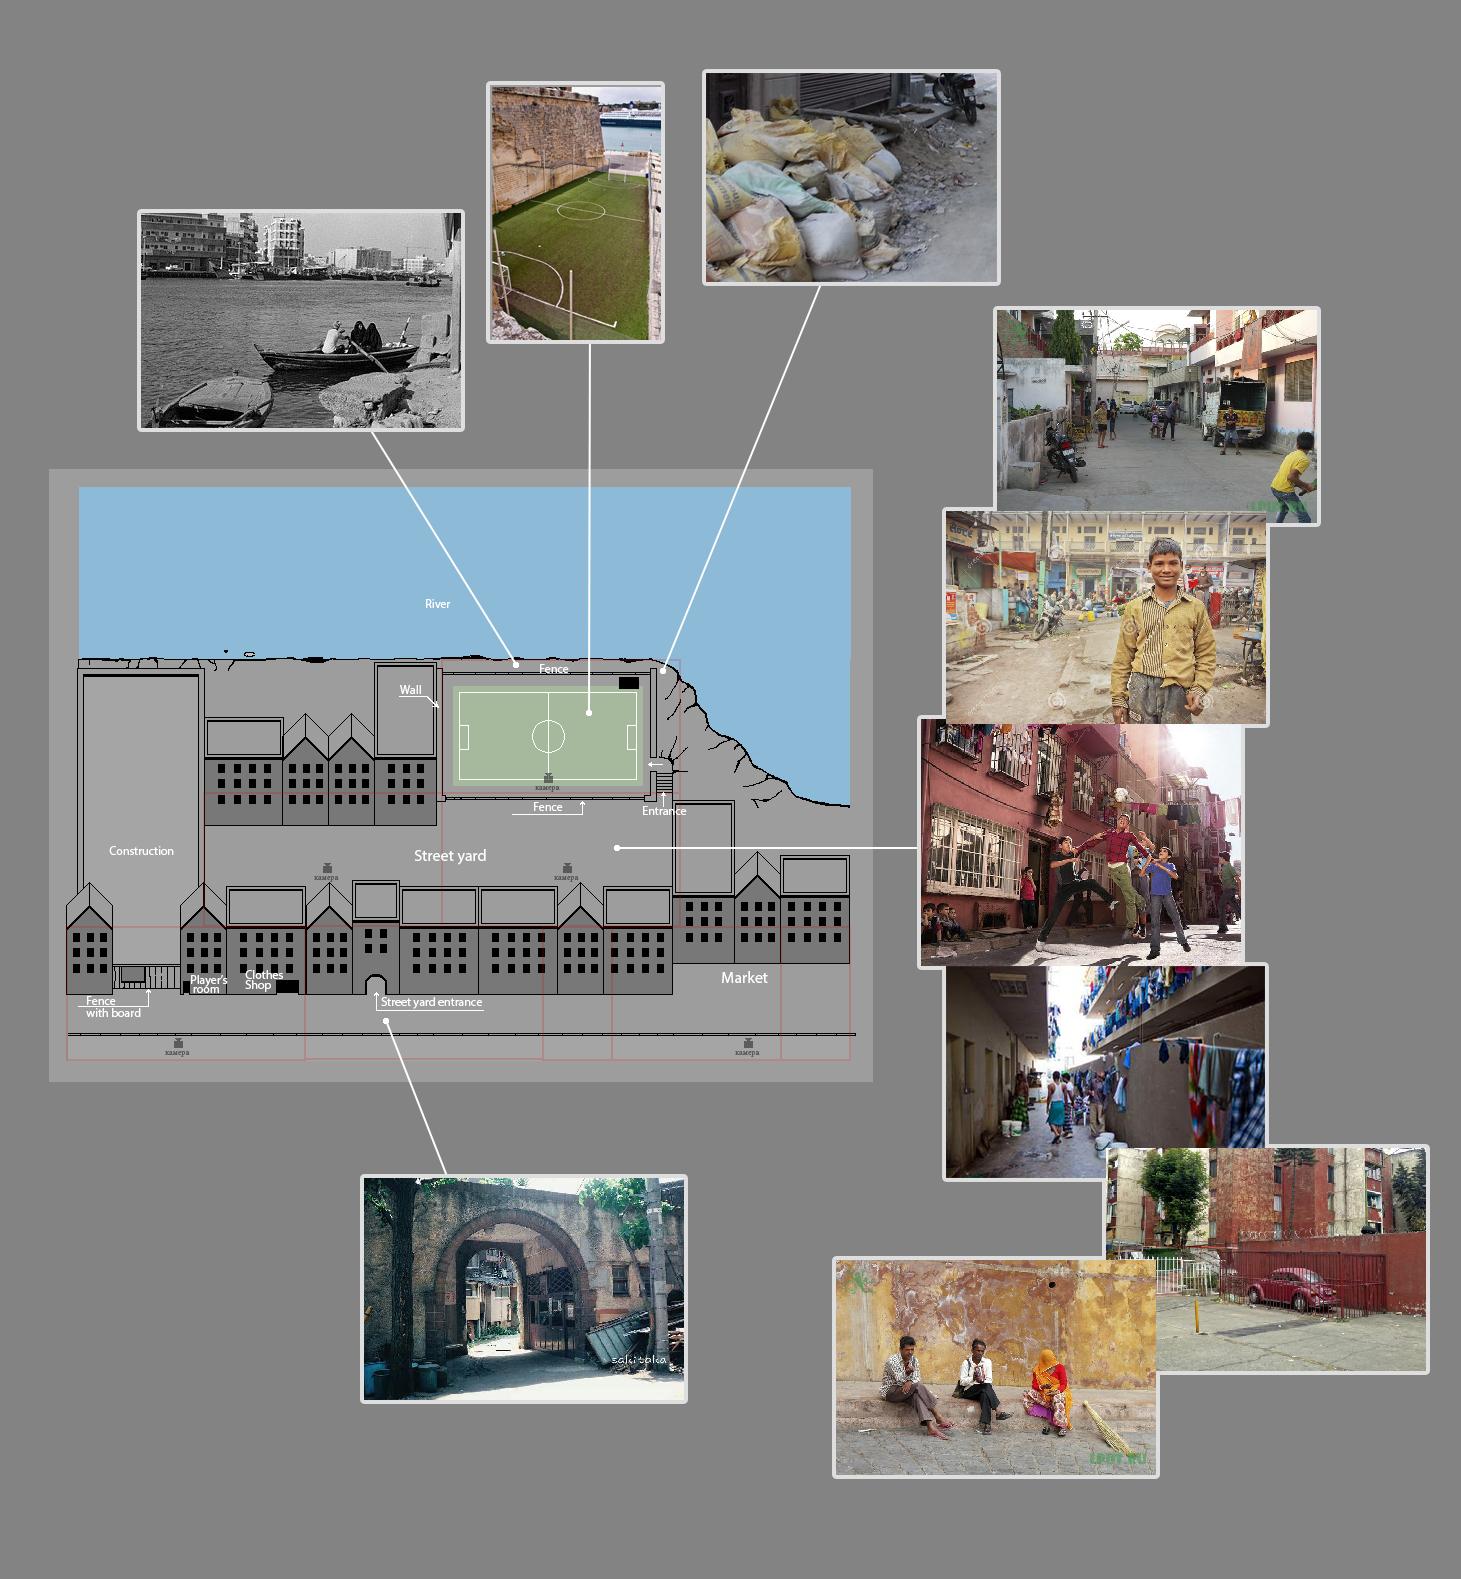 map city street yard ref